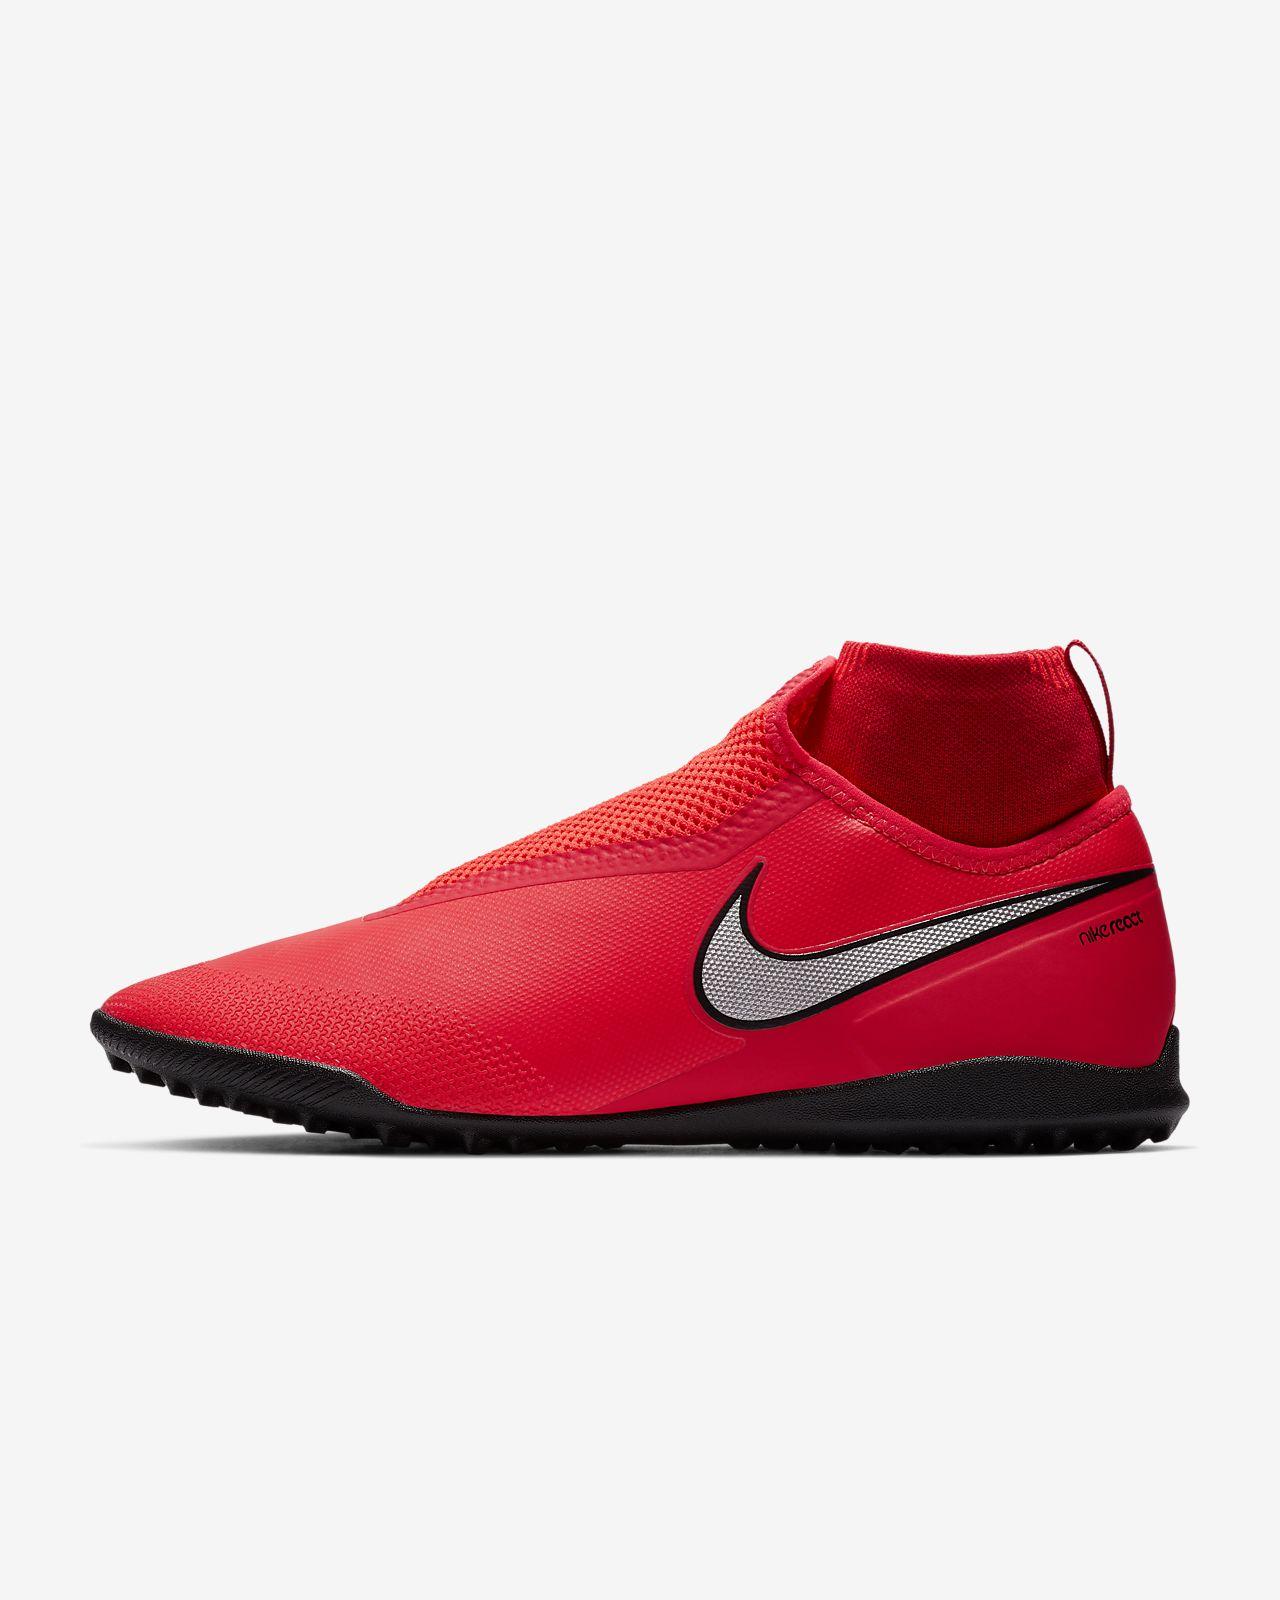 ... Nike React PhantomVSN Pro Dynamic Fit Game Over TF Botas de fútbol para  moqueta - Turf 878bc0a21f2e8